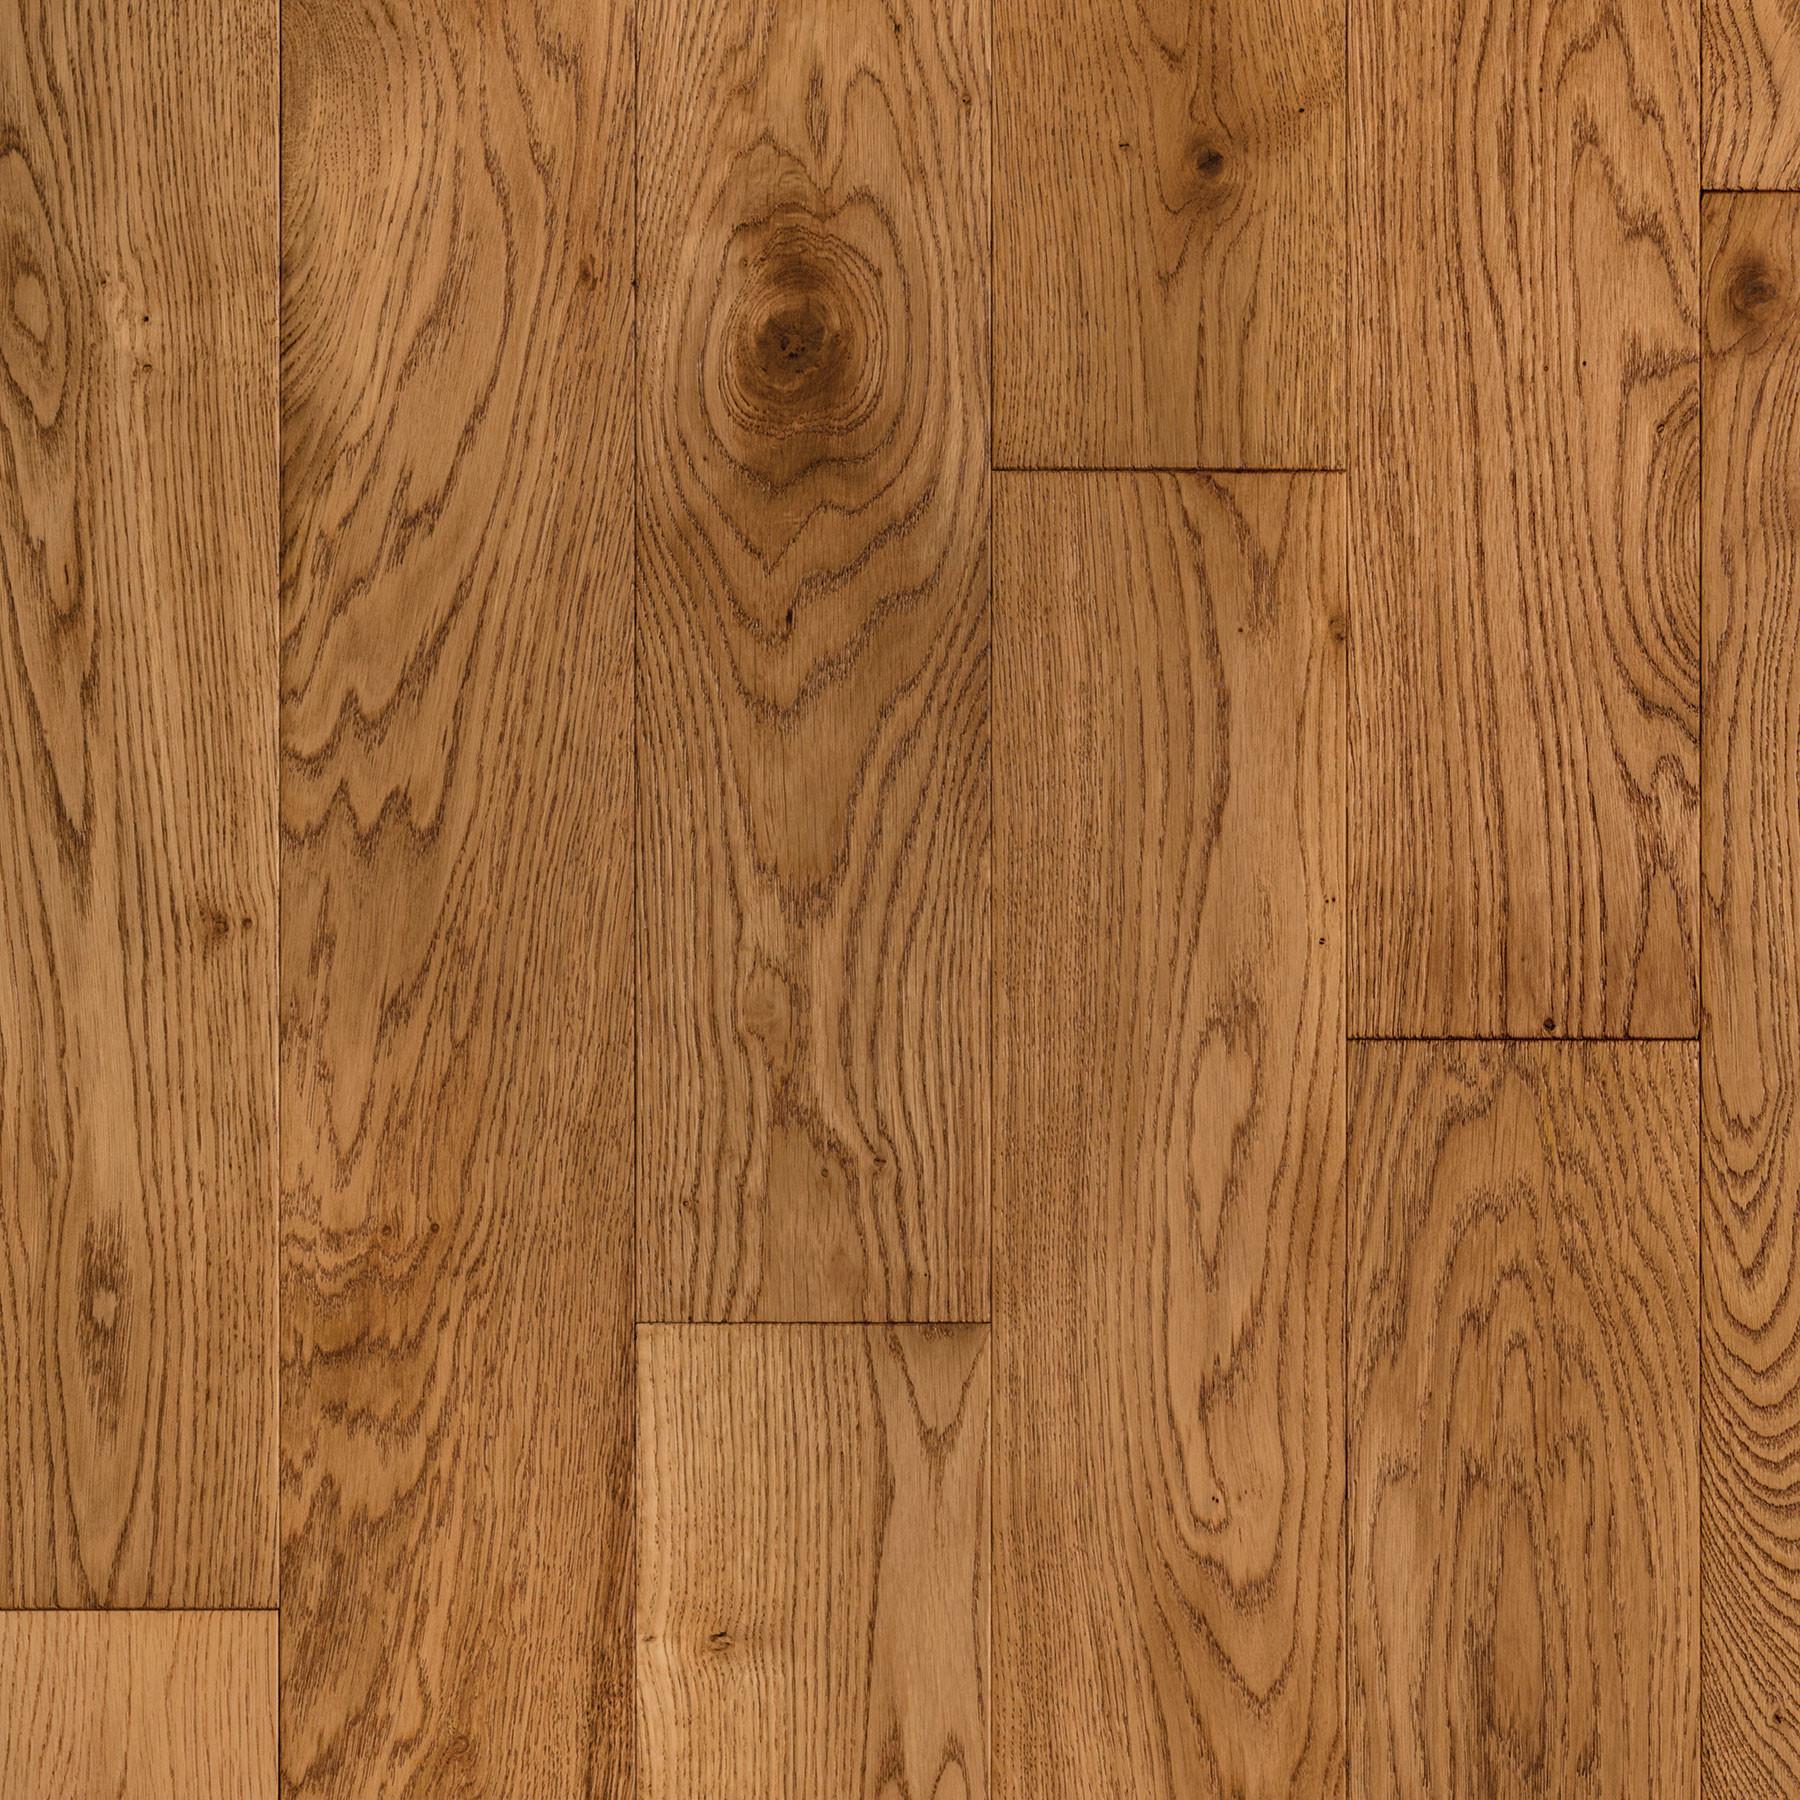 13 Perfect Bamboo Hardwood Flooring Canada 2021 free download bamboo hardwood flooring canada of harbor oak 5e280b3 white oak sand etx surfaces within etx